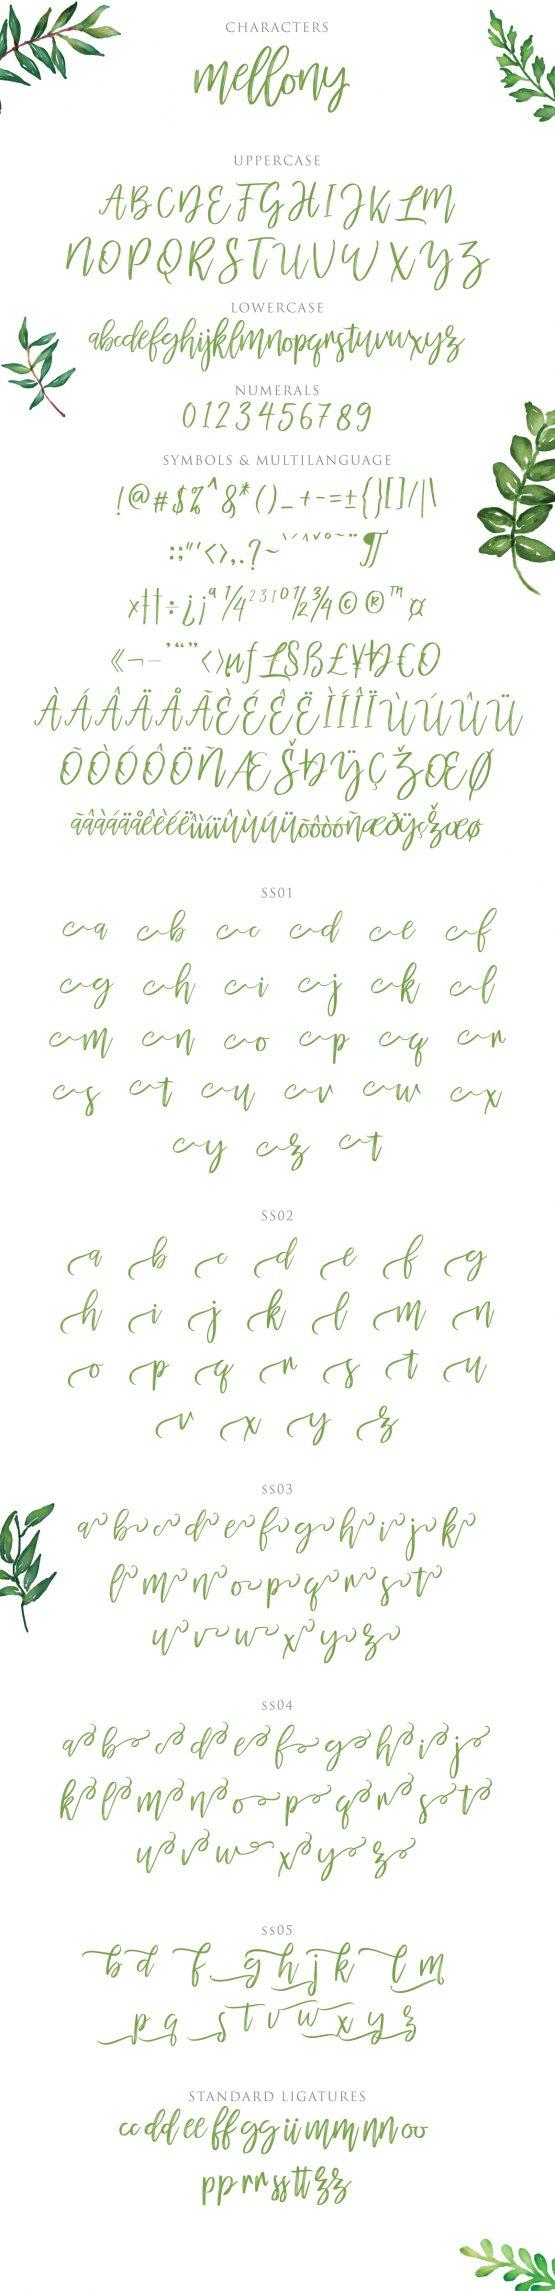 mellony brush script font